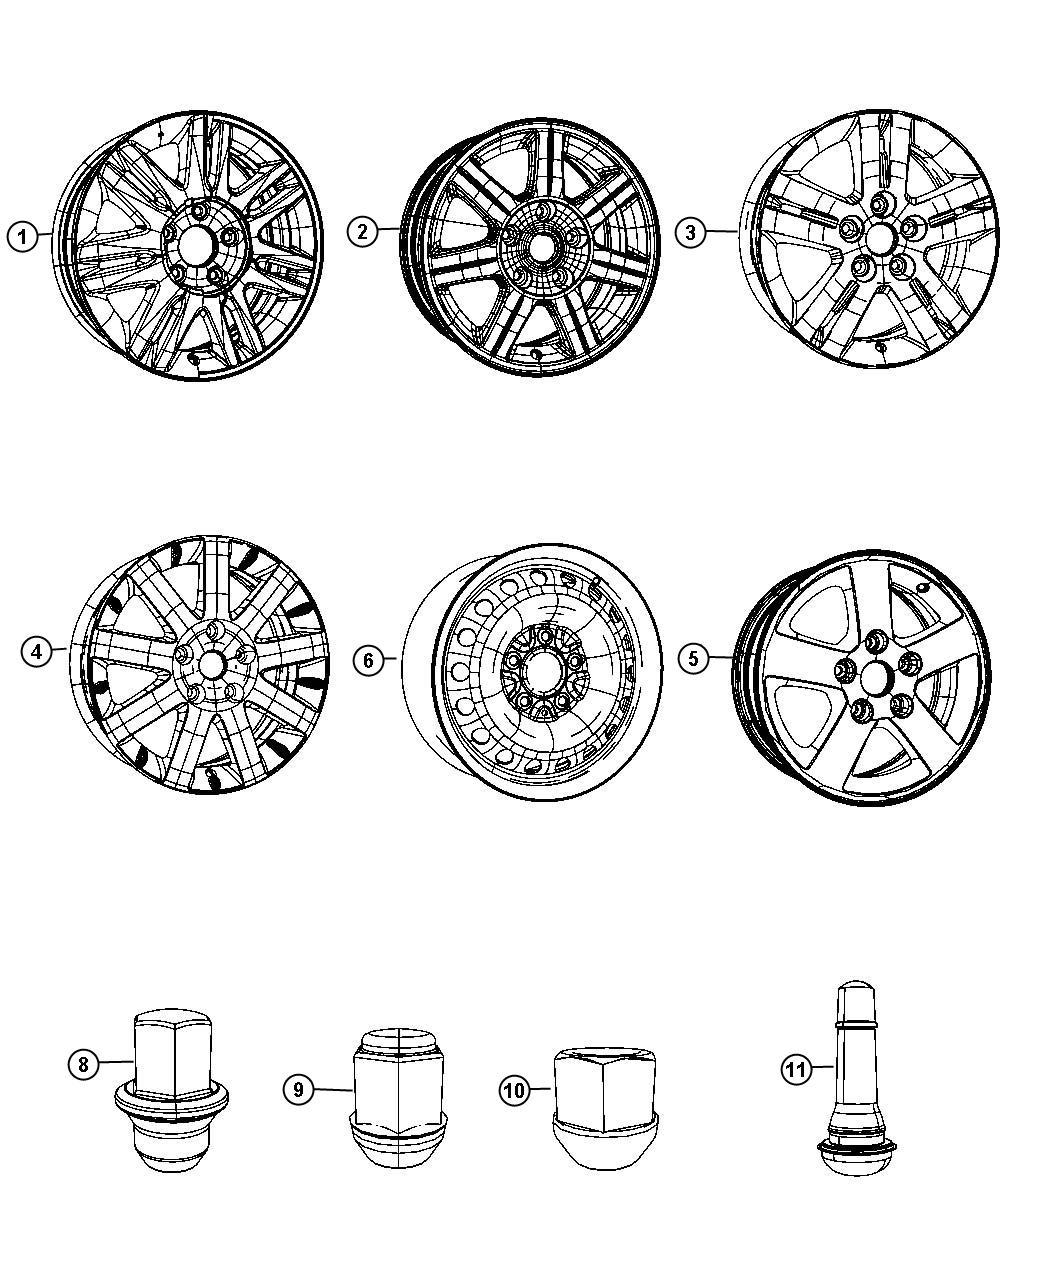 2010 Dodge Grand Caravan Wheel. Aluminum. [17x6.5 aluminum